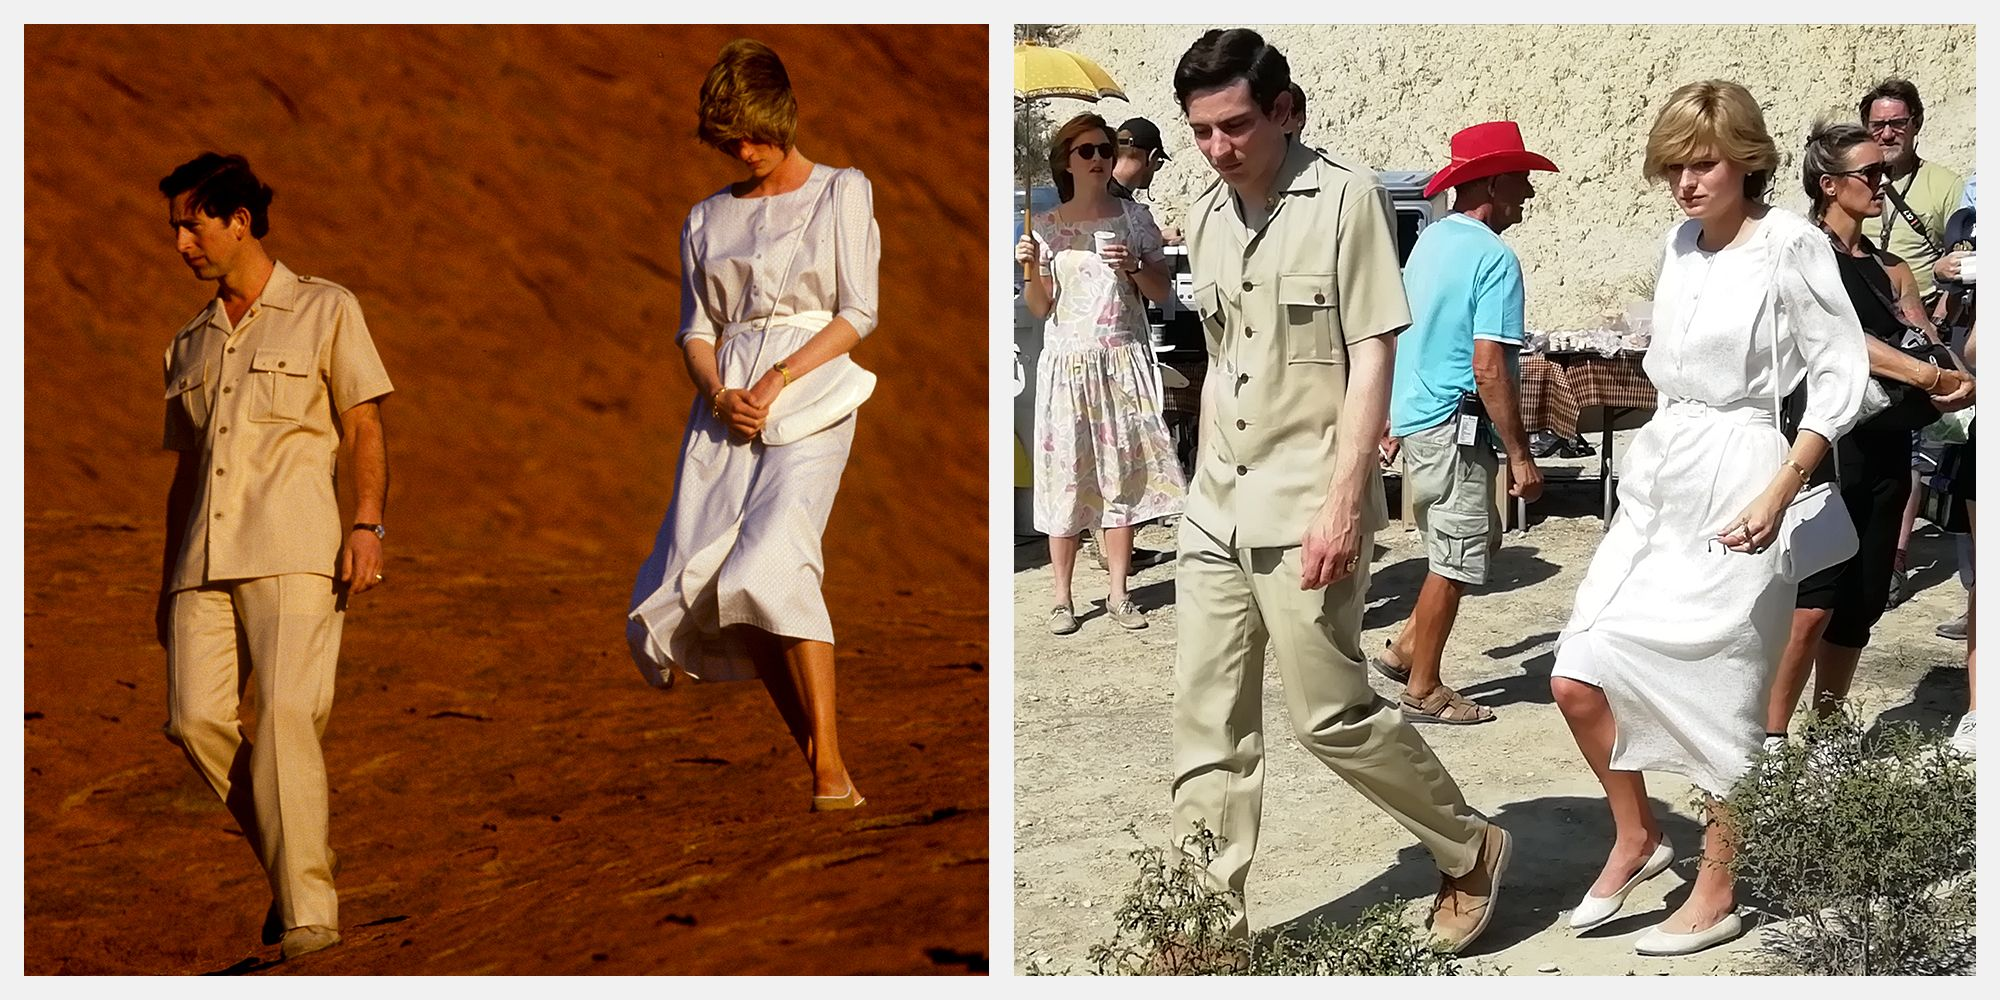 princess diana prince charles s 1983 australia tour inspires the crown season 4 prince charles s 1983 australia tour